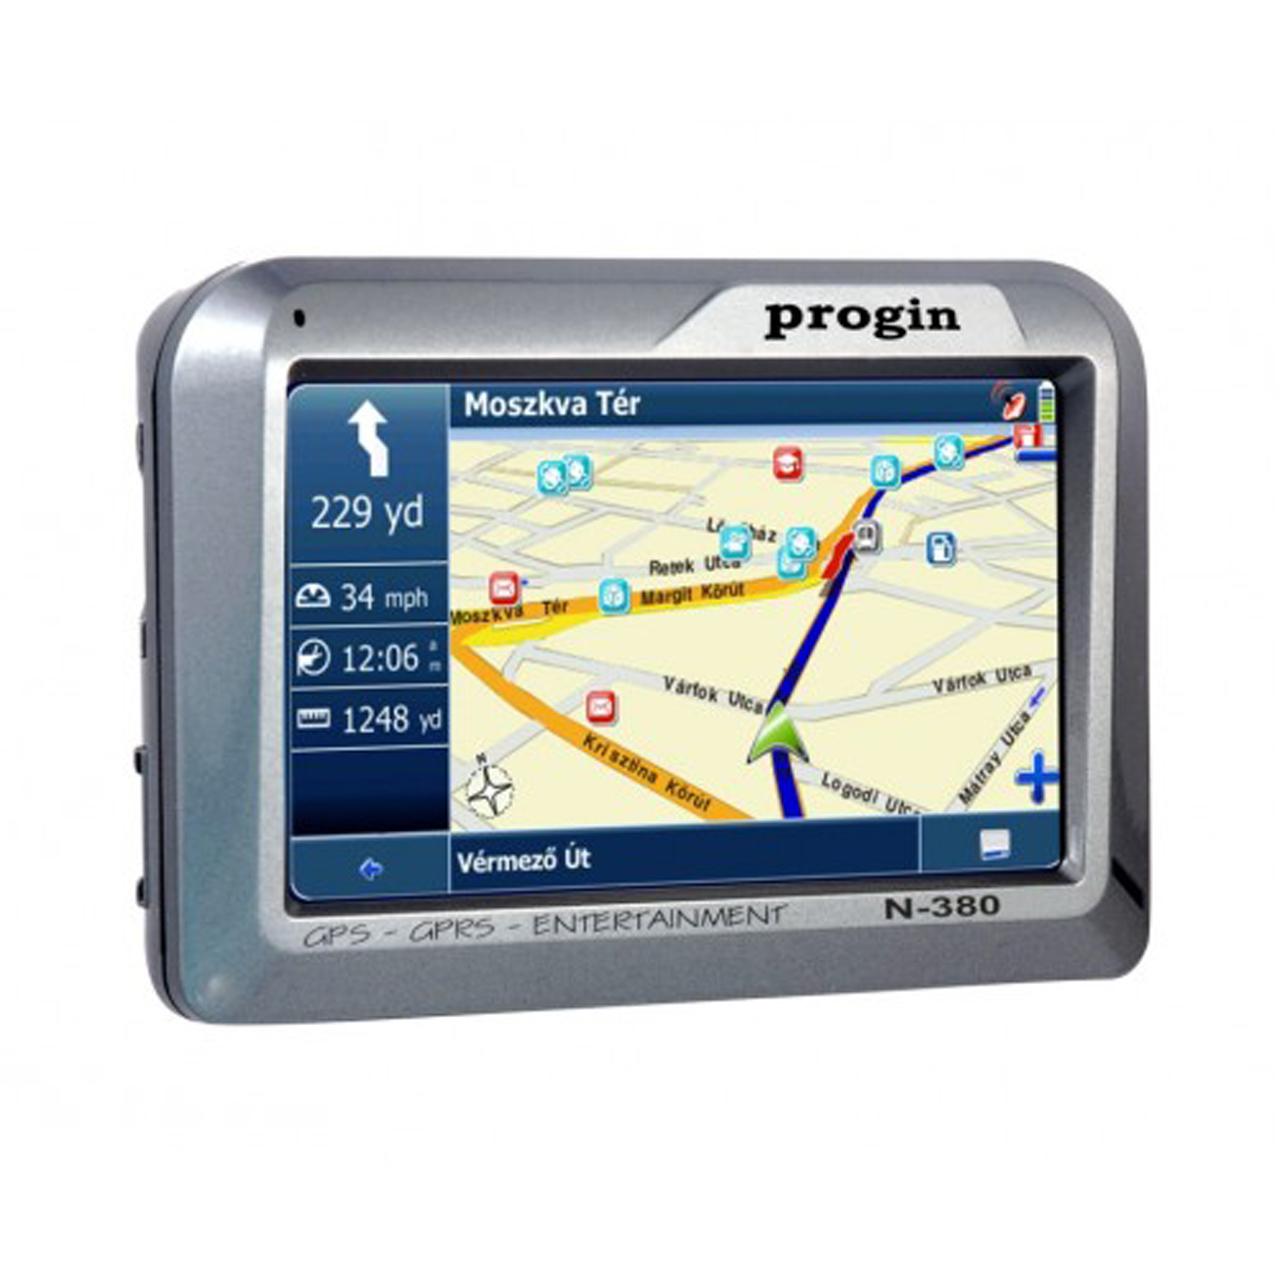 خرید اینترنتی                     مسیریاب خودرو پروجین مدل N-380